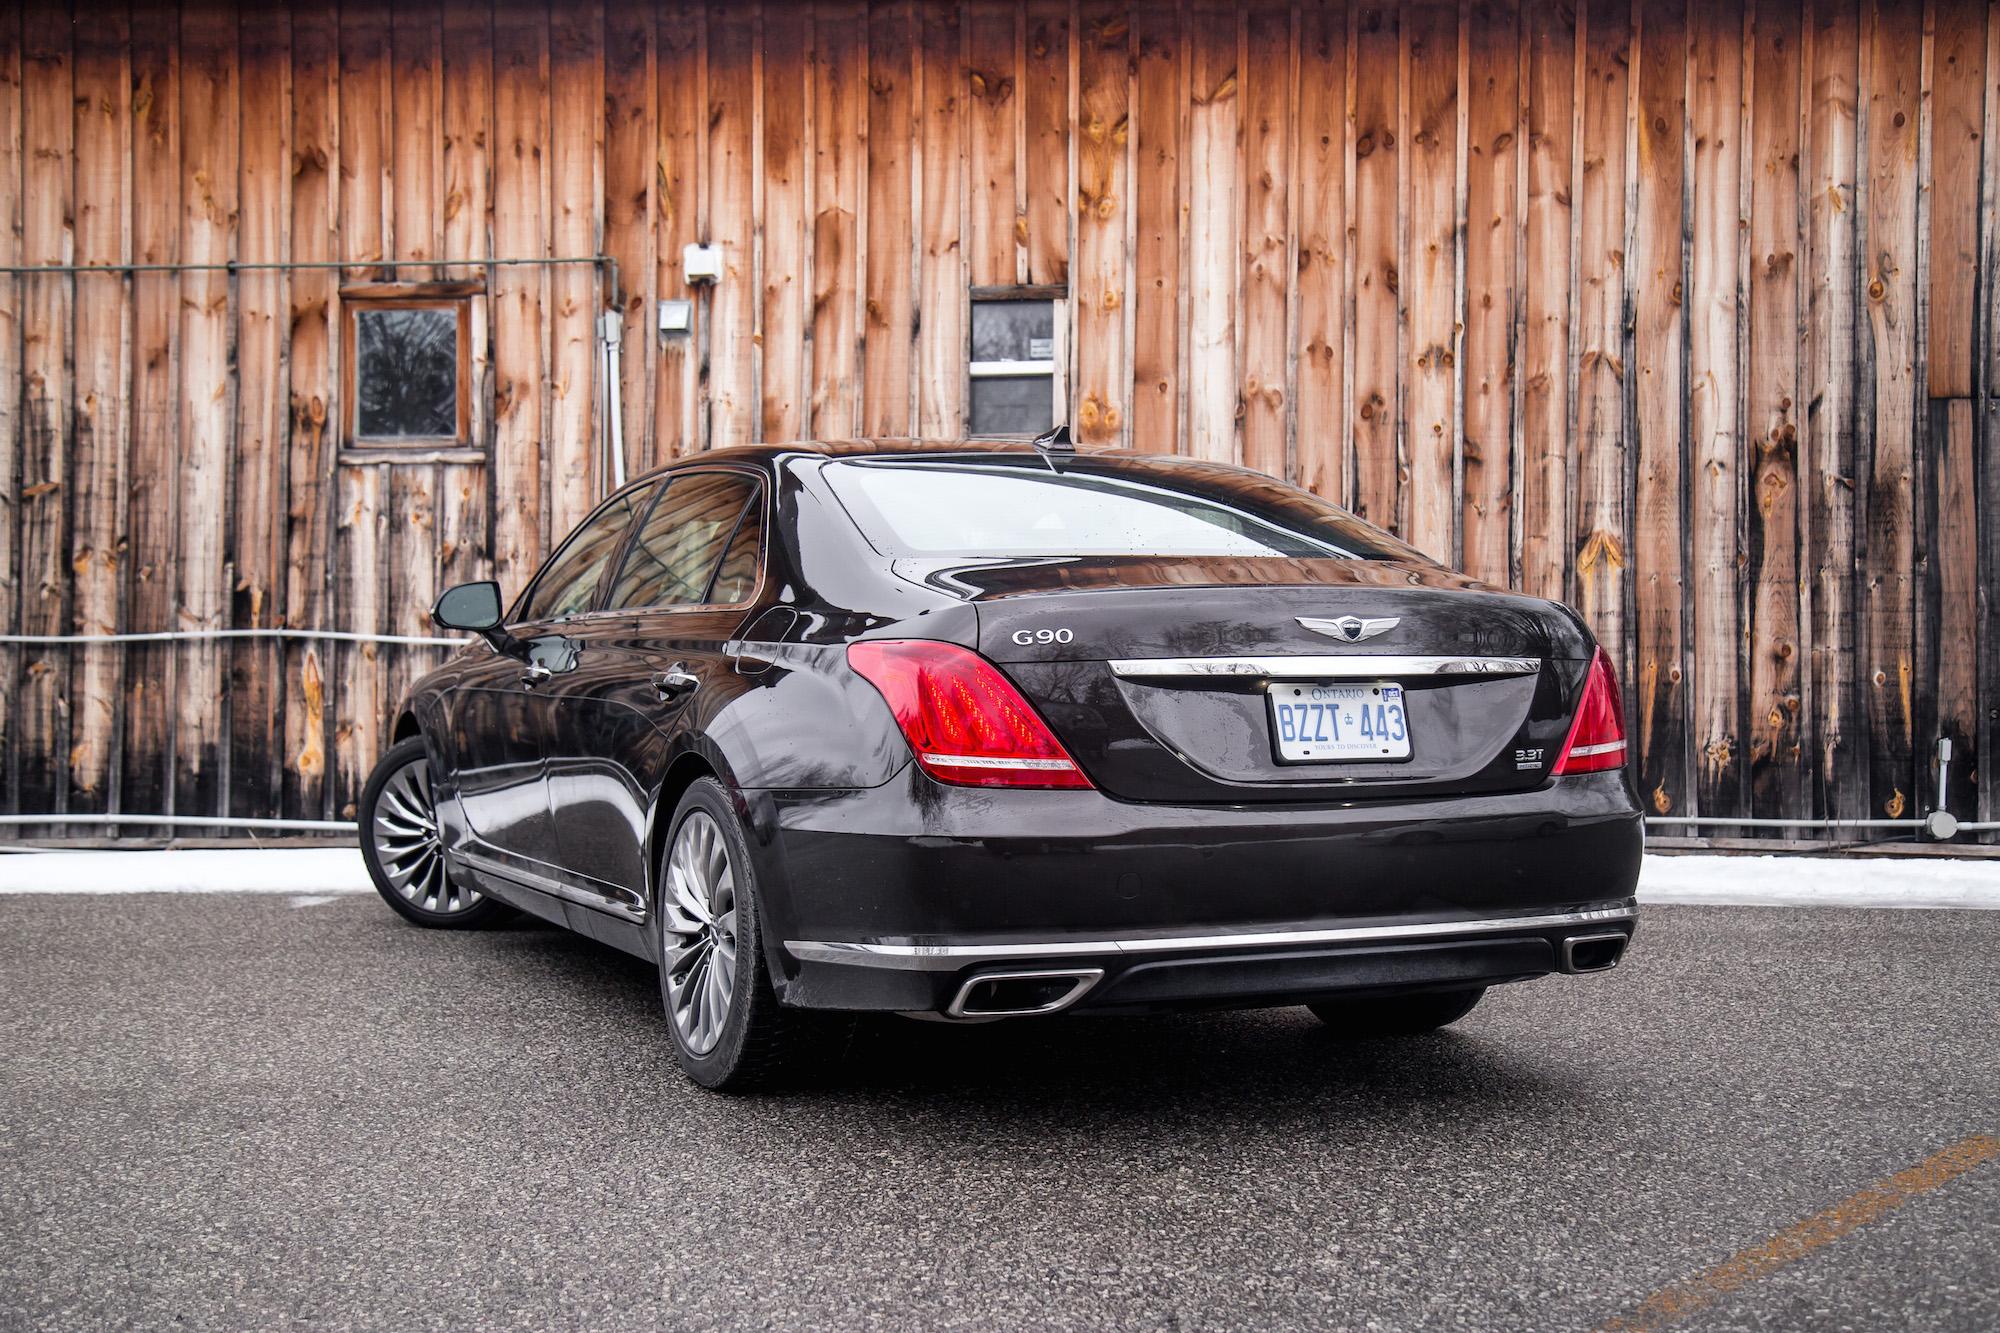 Lastest Review 2017 Genesis G90 33T  Canadian Auto Review